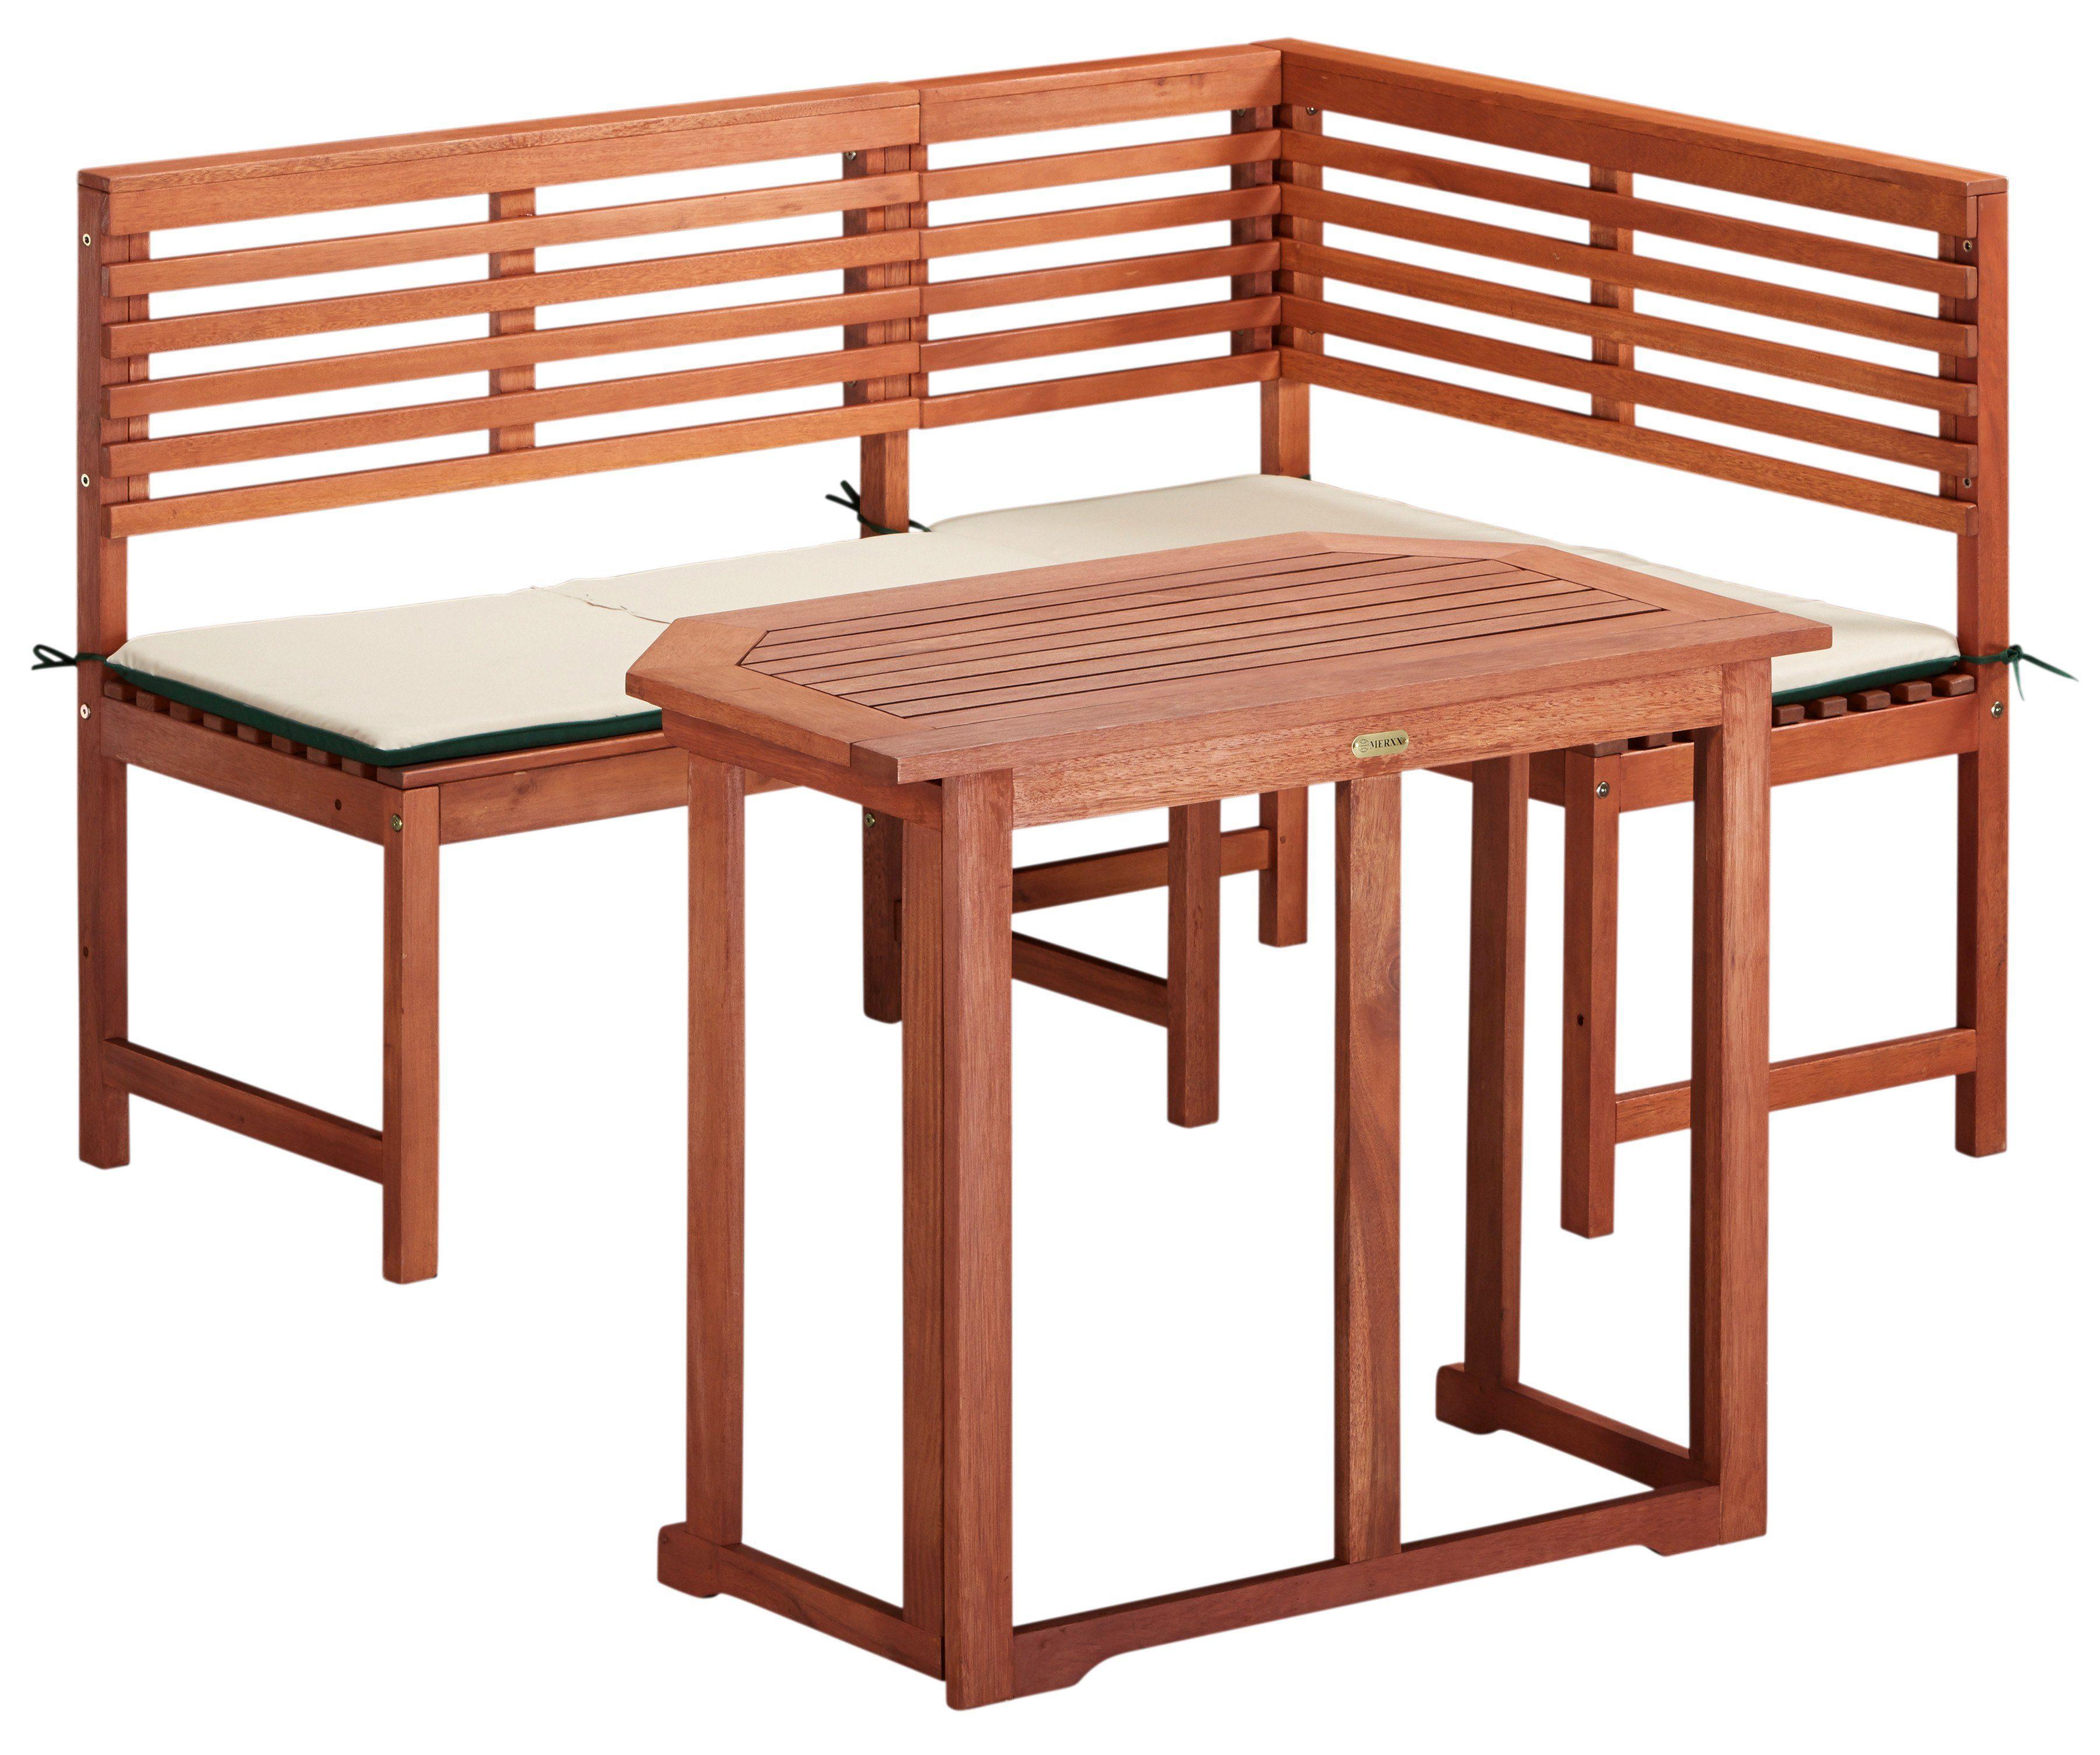 Gartenmöbelset , Eckbank, Klapptisch 90x60 cm, Eukalyptusholz, braun